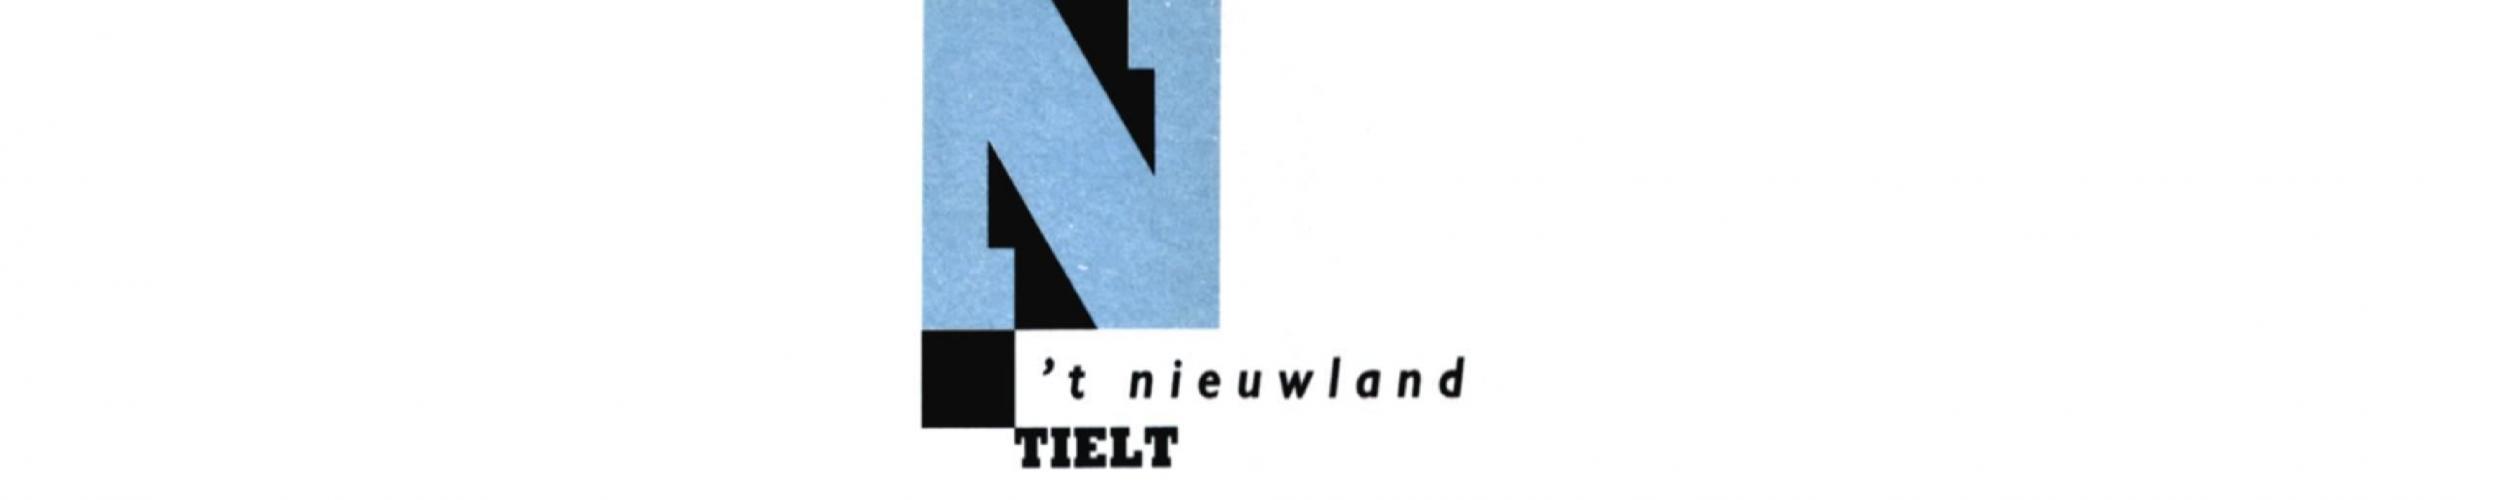 t' Nieuwland